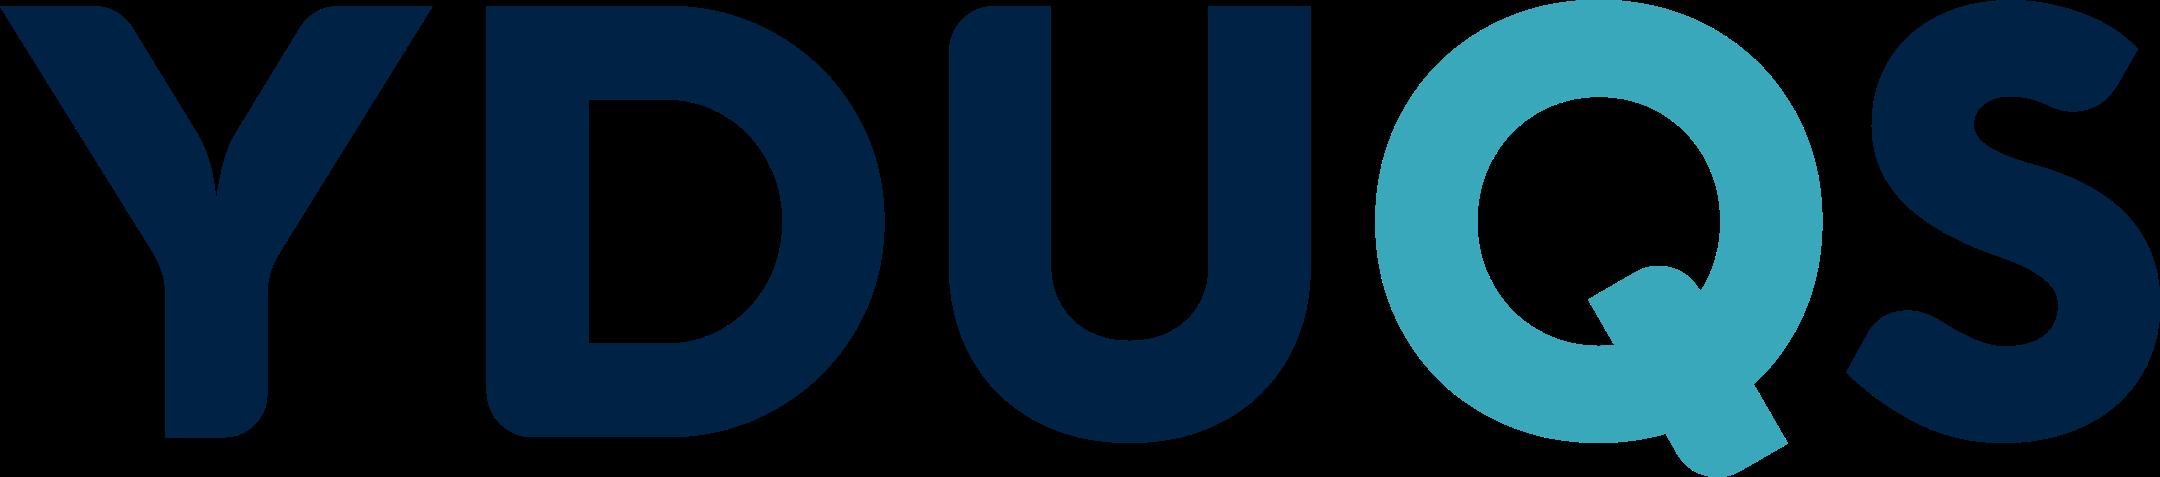 yduqs logo 1 - YDUQS Logo